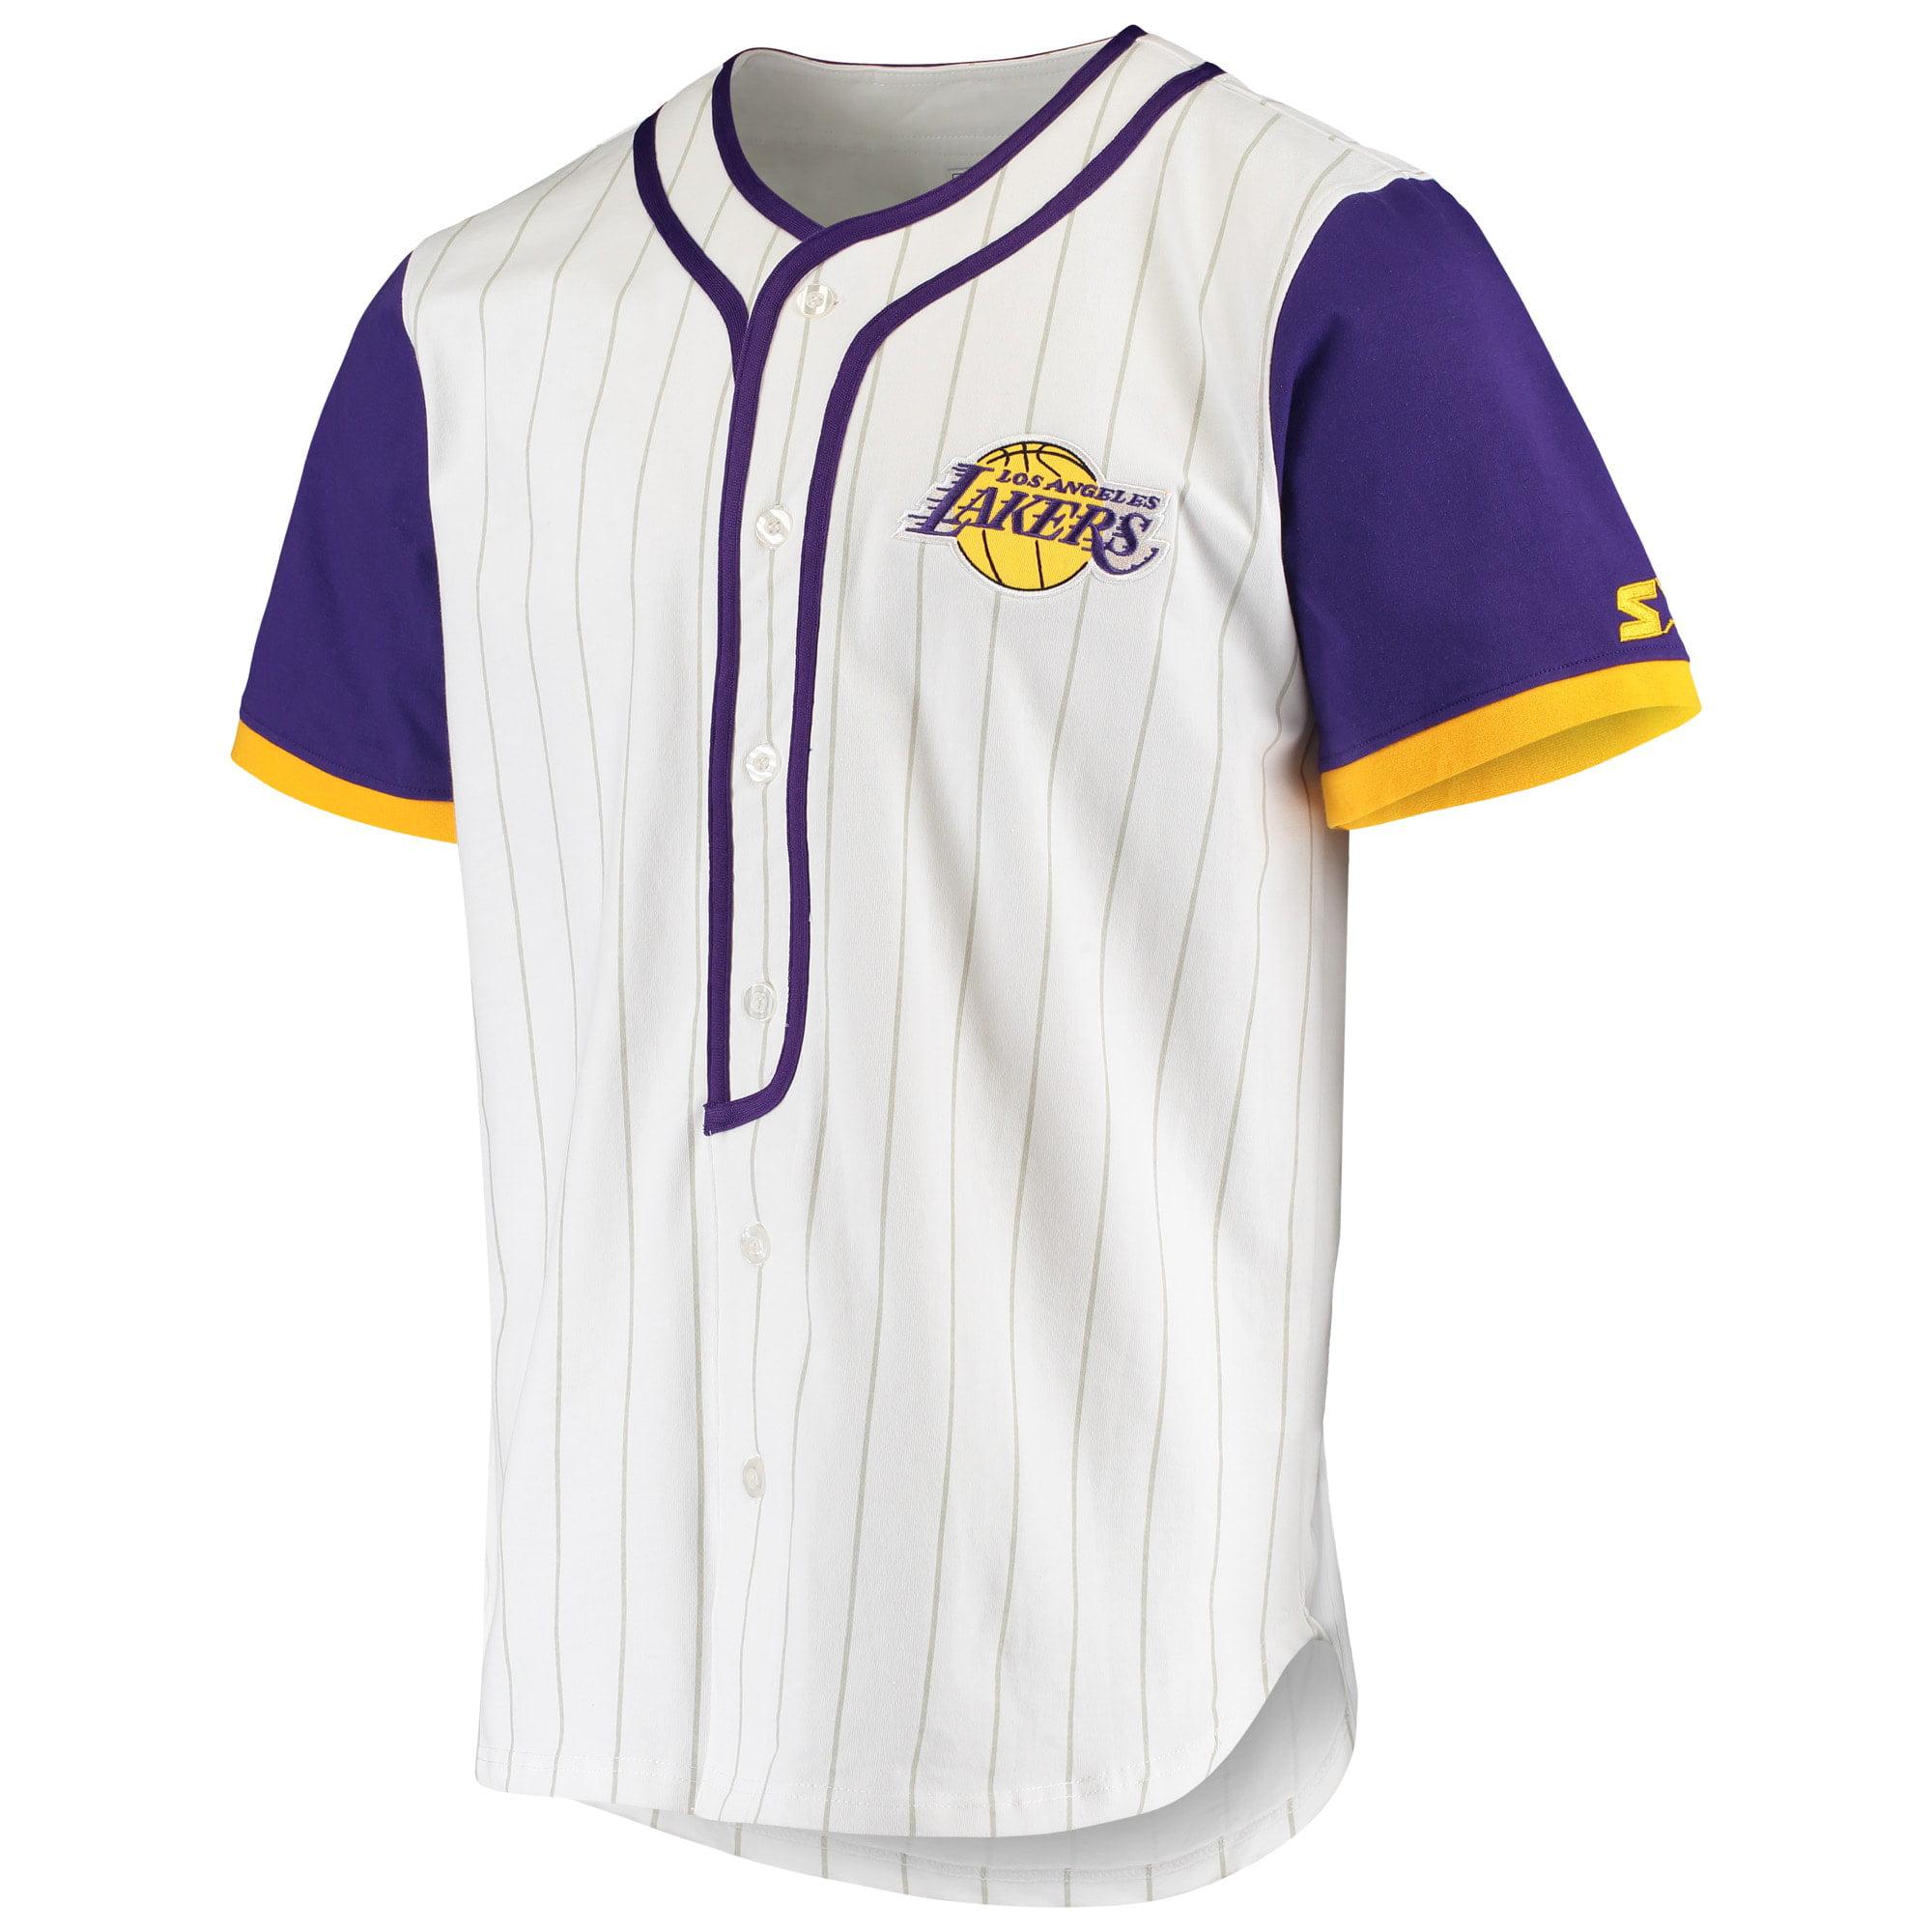 Los Angeles Lakers Starter Scout Baseball Fashion Jersey - White